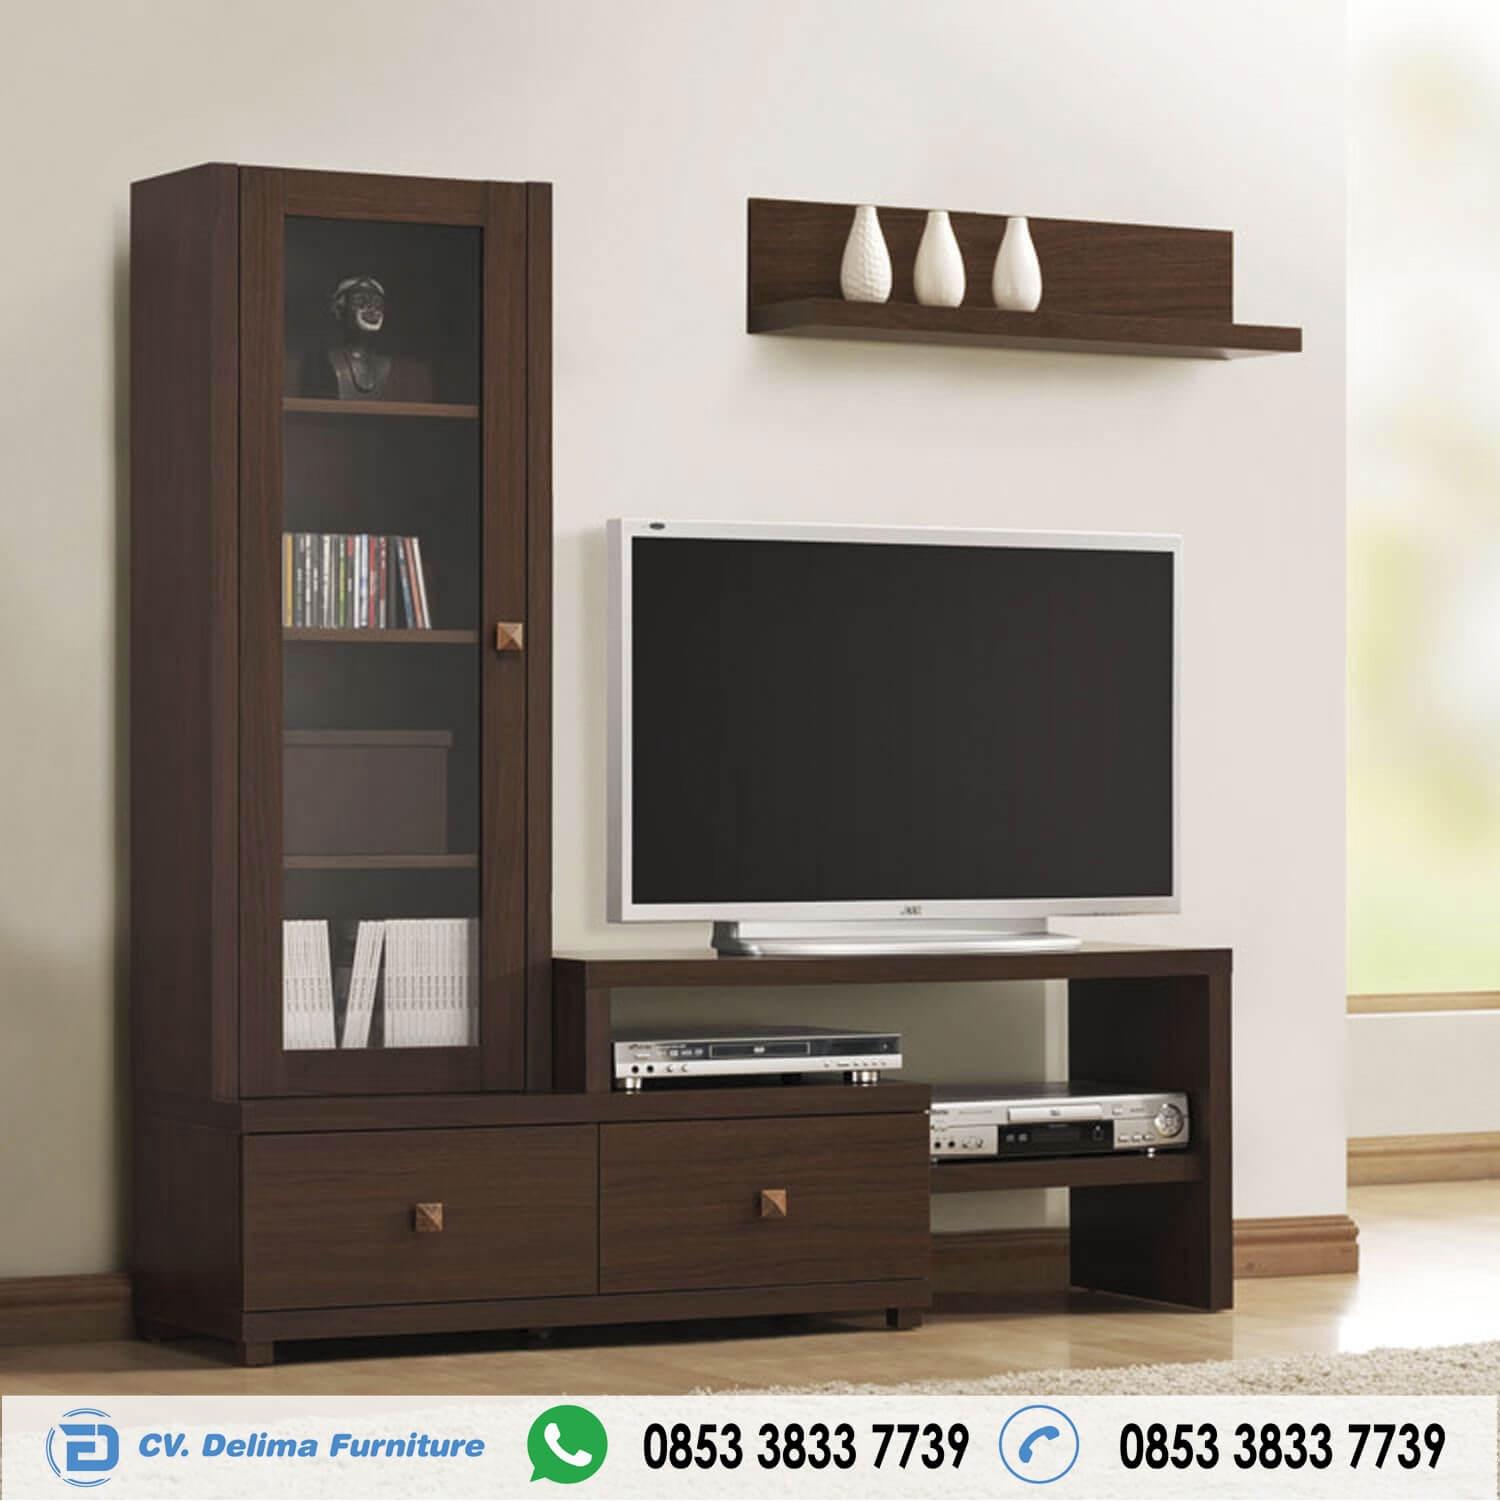 Minimalist Teak Tv Sideboard design L